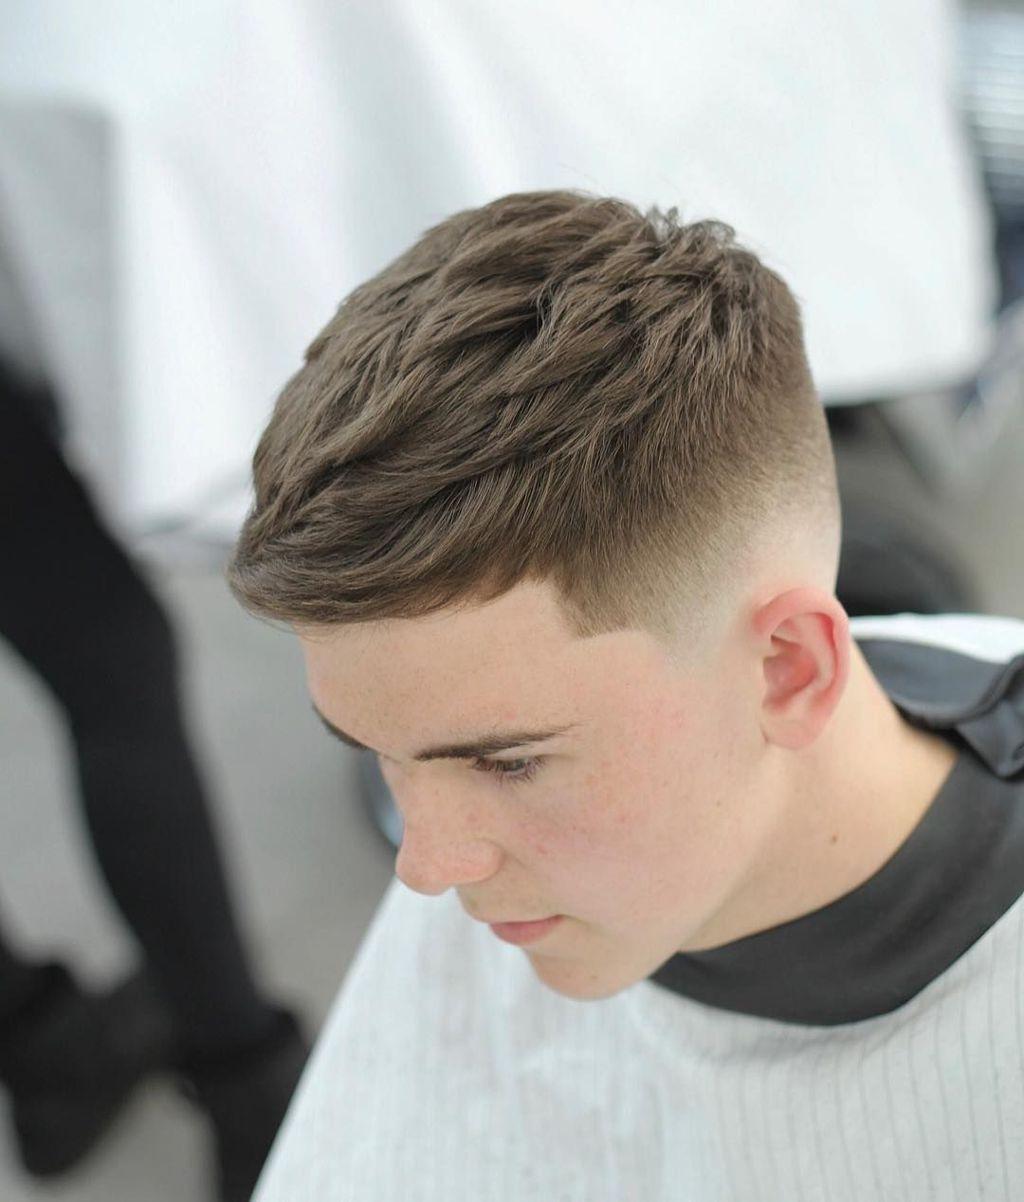 10 Fasson Haarschnitt Mit Ubergang Frauen Kinder Klassisch Jungen Fur Manner In 2020 Fasson Haarschnitt Coole Frisuren Haarschnitt